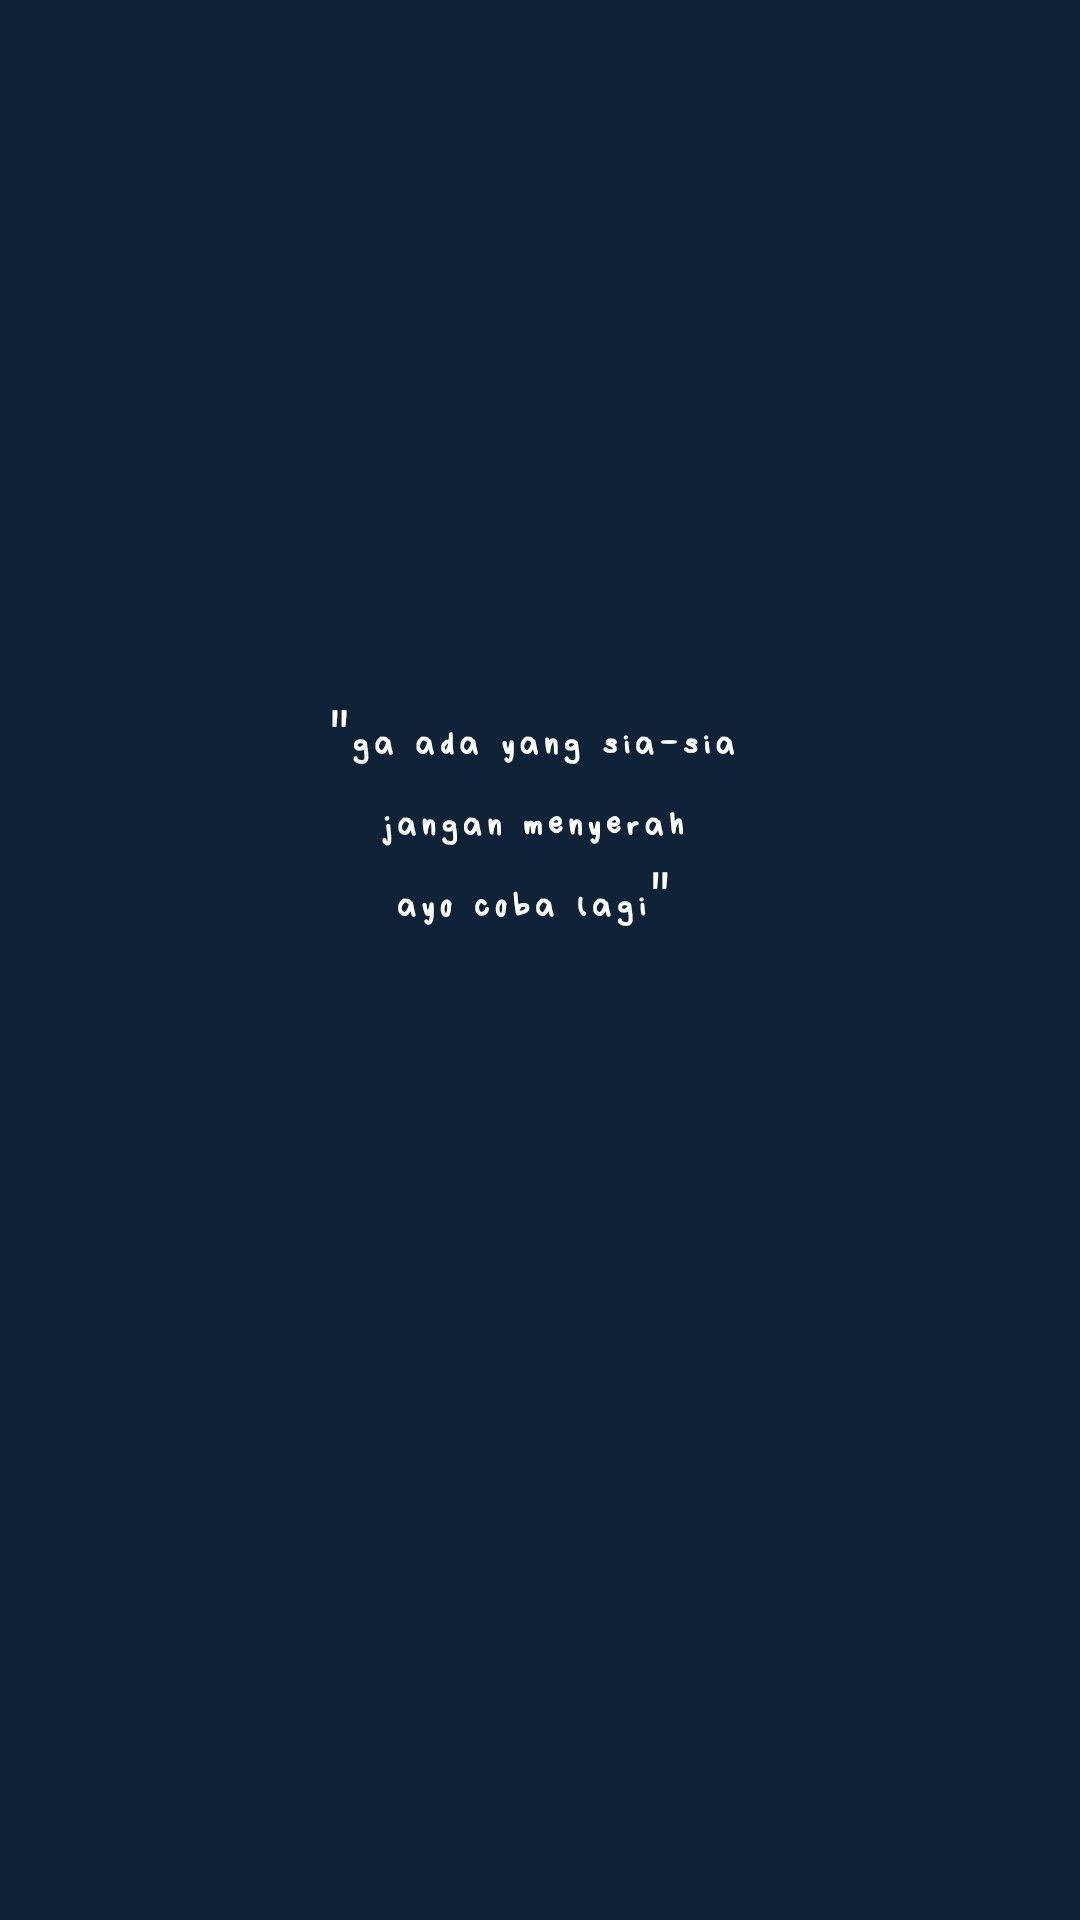 Quotes Bucin Lucu Quotes Bucin Quotes Quotes Bucin Quotes